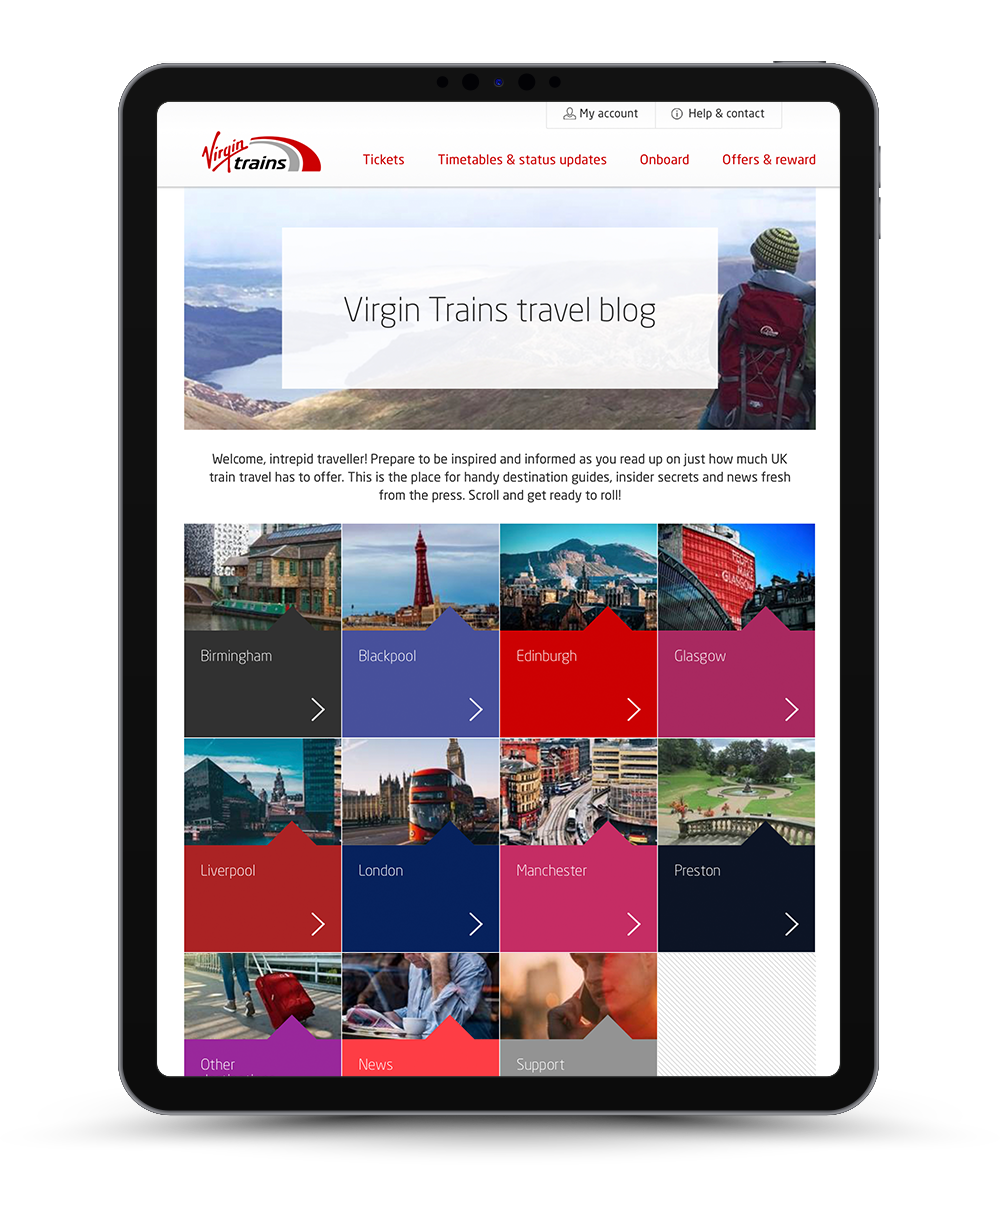 Virgin Trains travel blog-iPad.png